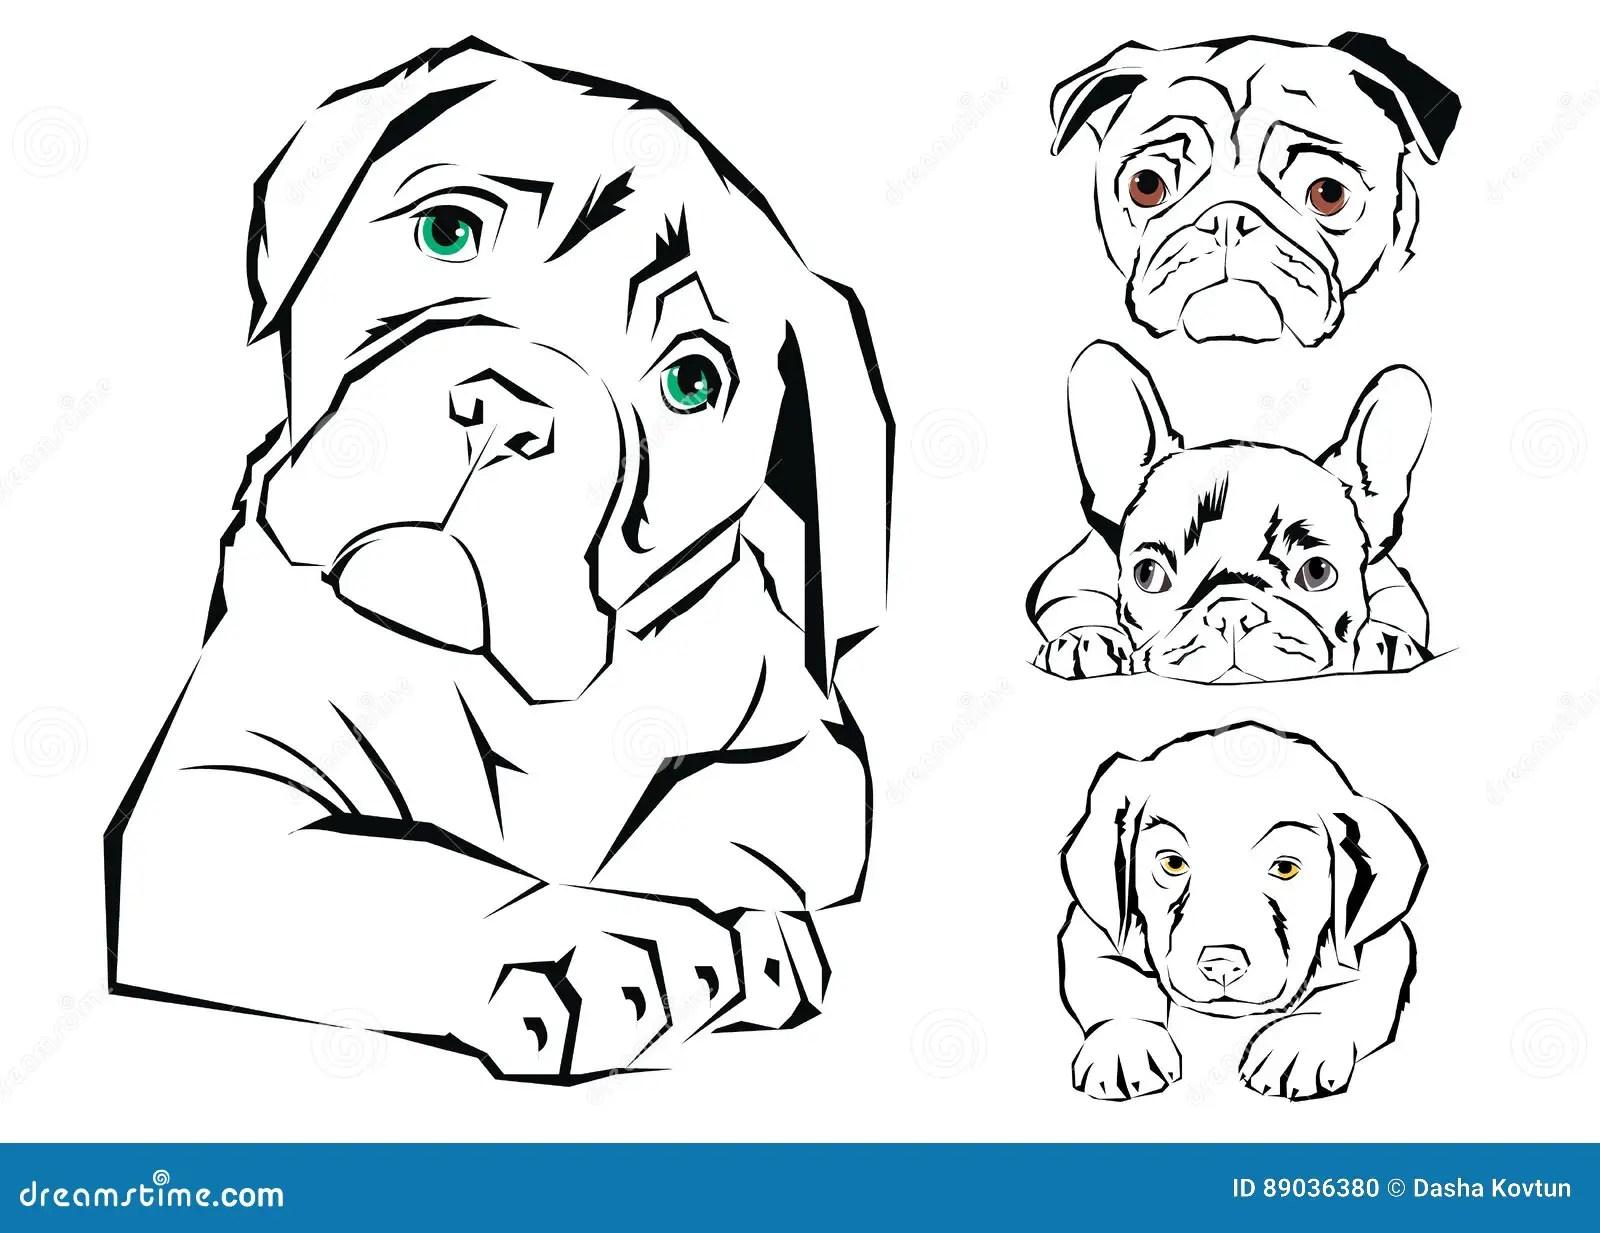 Icon Design Dog Vector Emblem Illustration Stock Vector